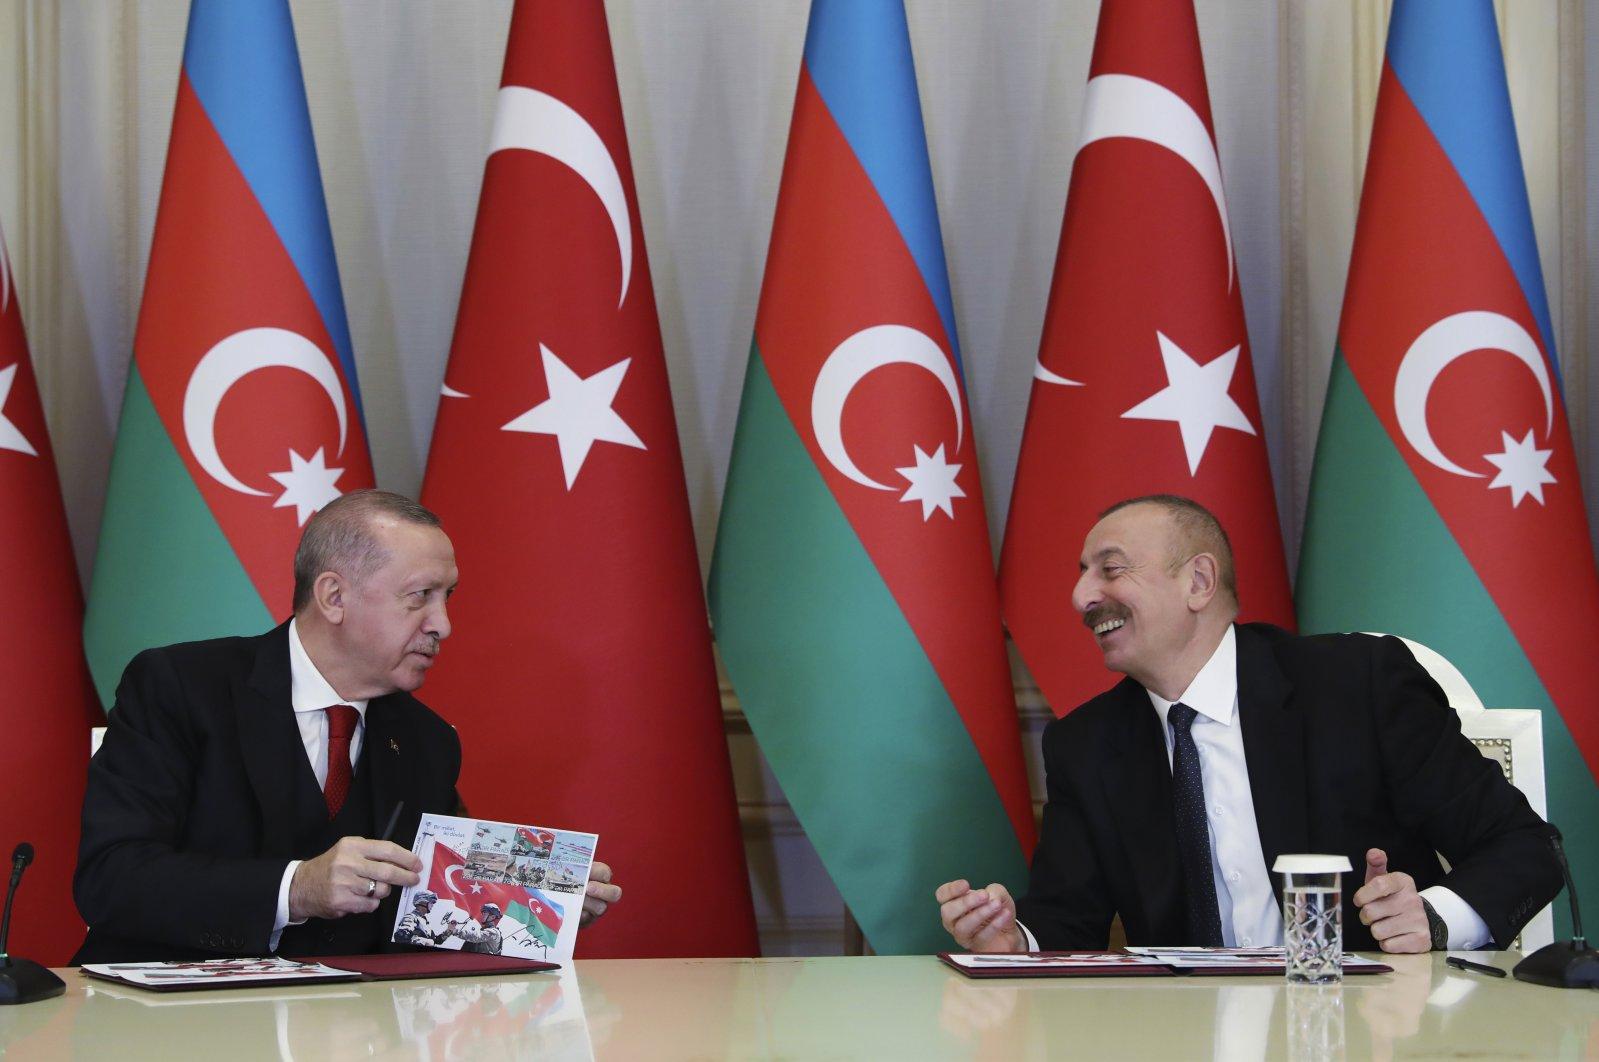 President Recep Tayyip Erdoğan (L) and Azerbaijan's President Ilham Aliyev talk during a joint news conference following their meeting in Baku, Azerbaijan, Dec. 10, 2020. (AP Photo)